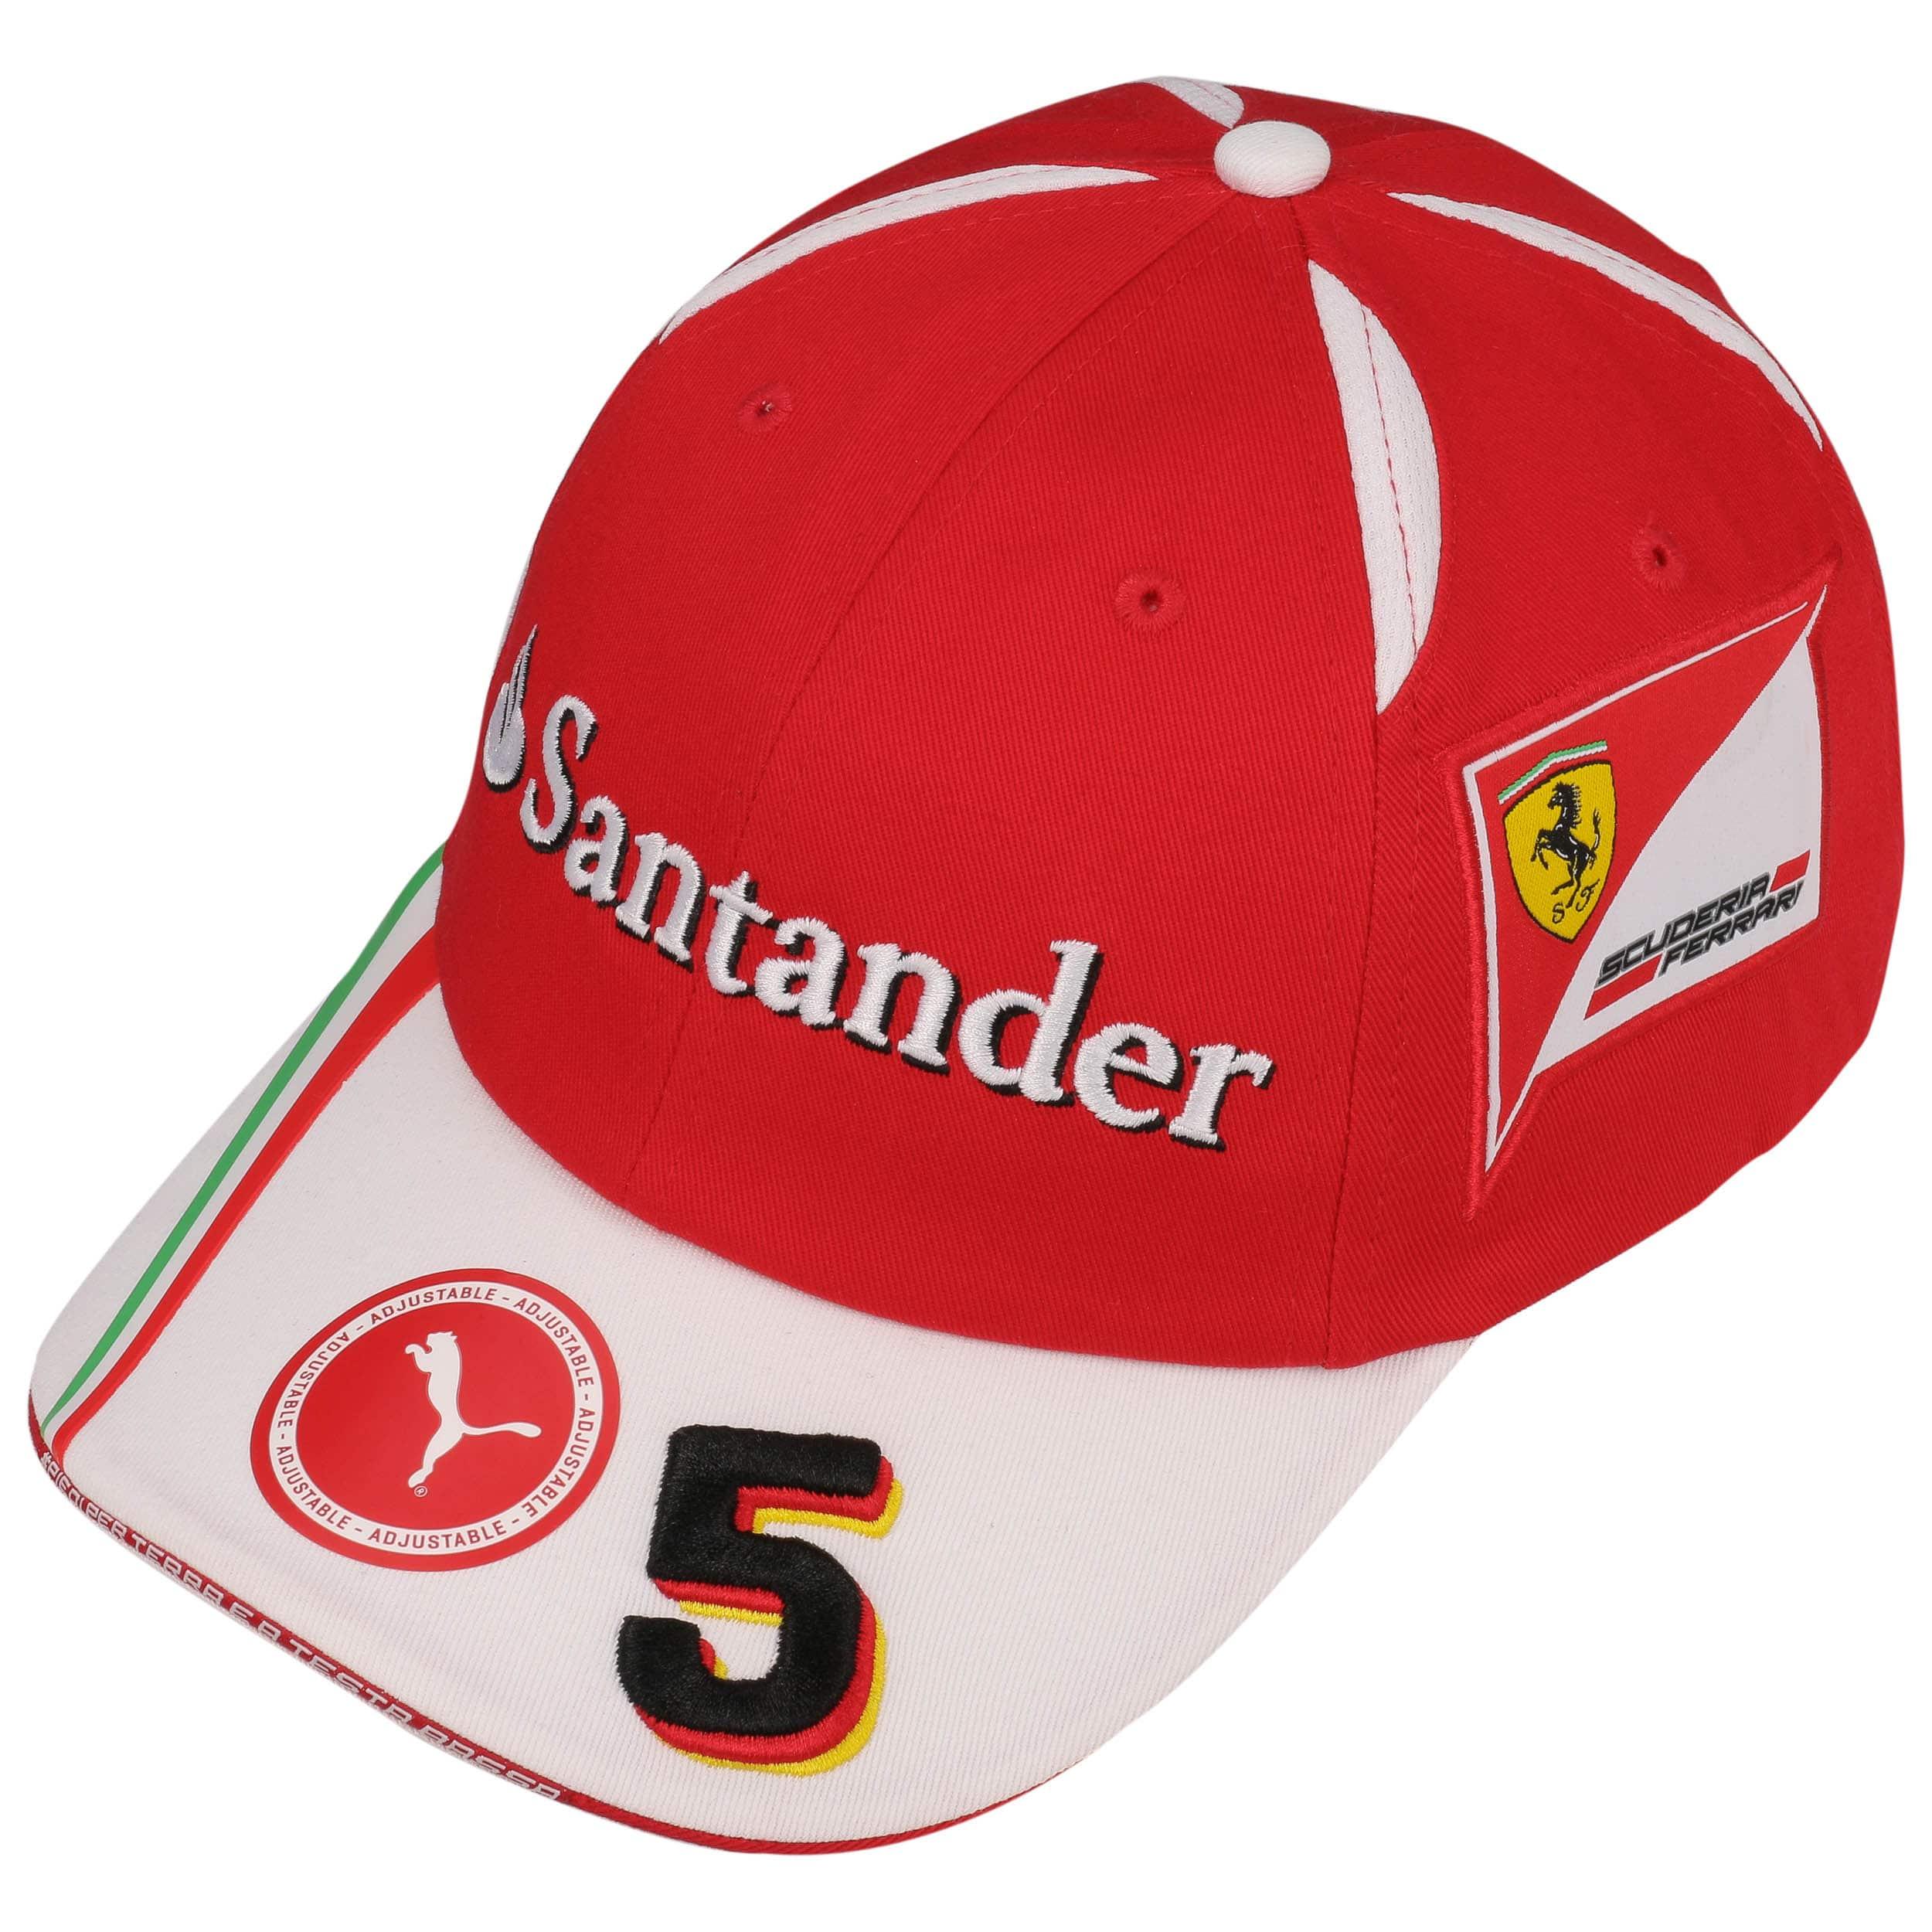 Ferrari Replica Vettel Cap by PUMA - rosso 1 ... a0988d4eab9d